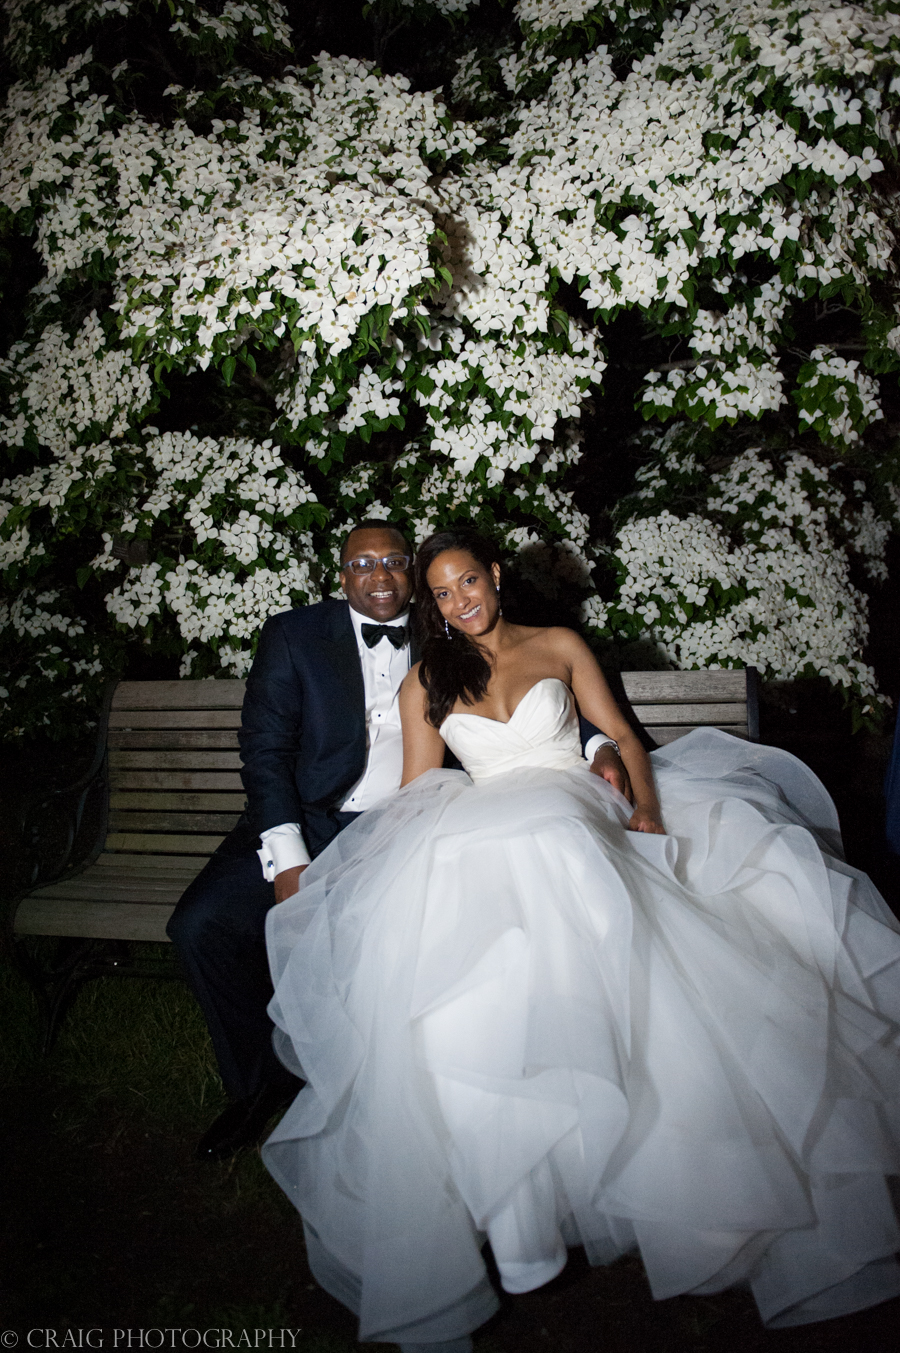 Phipps Conseratory Weddings | Wedding Photo Booth Homemade Moss Frame-0016